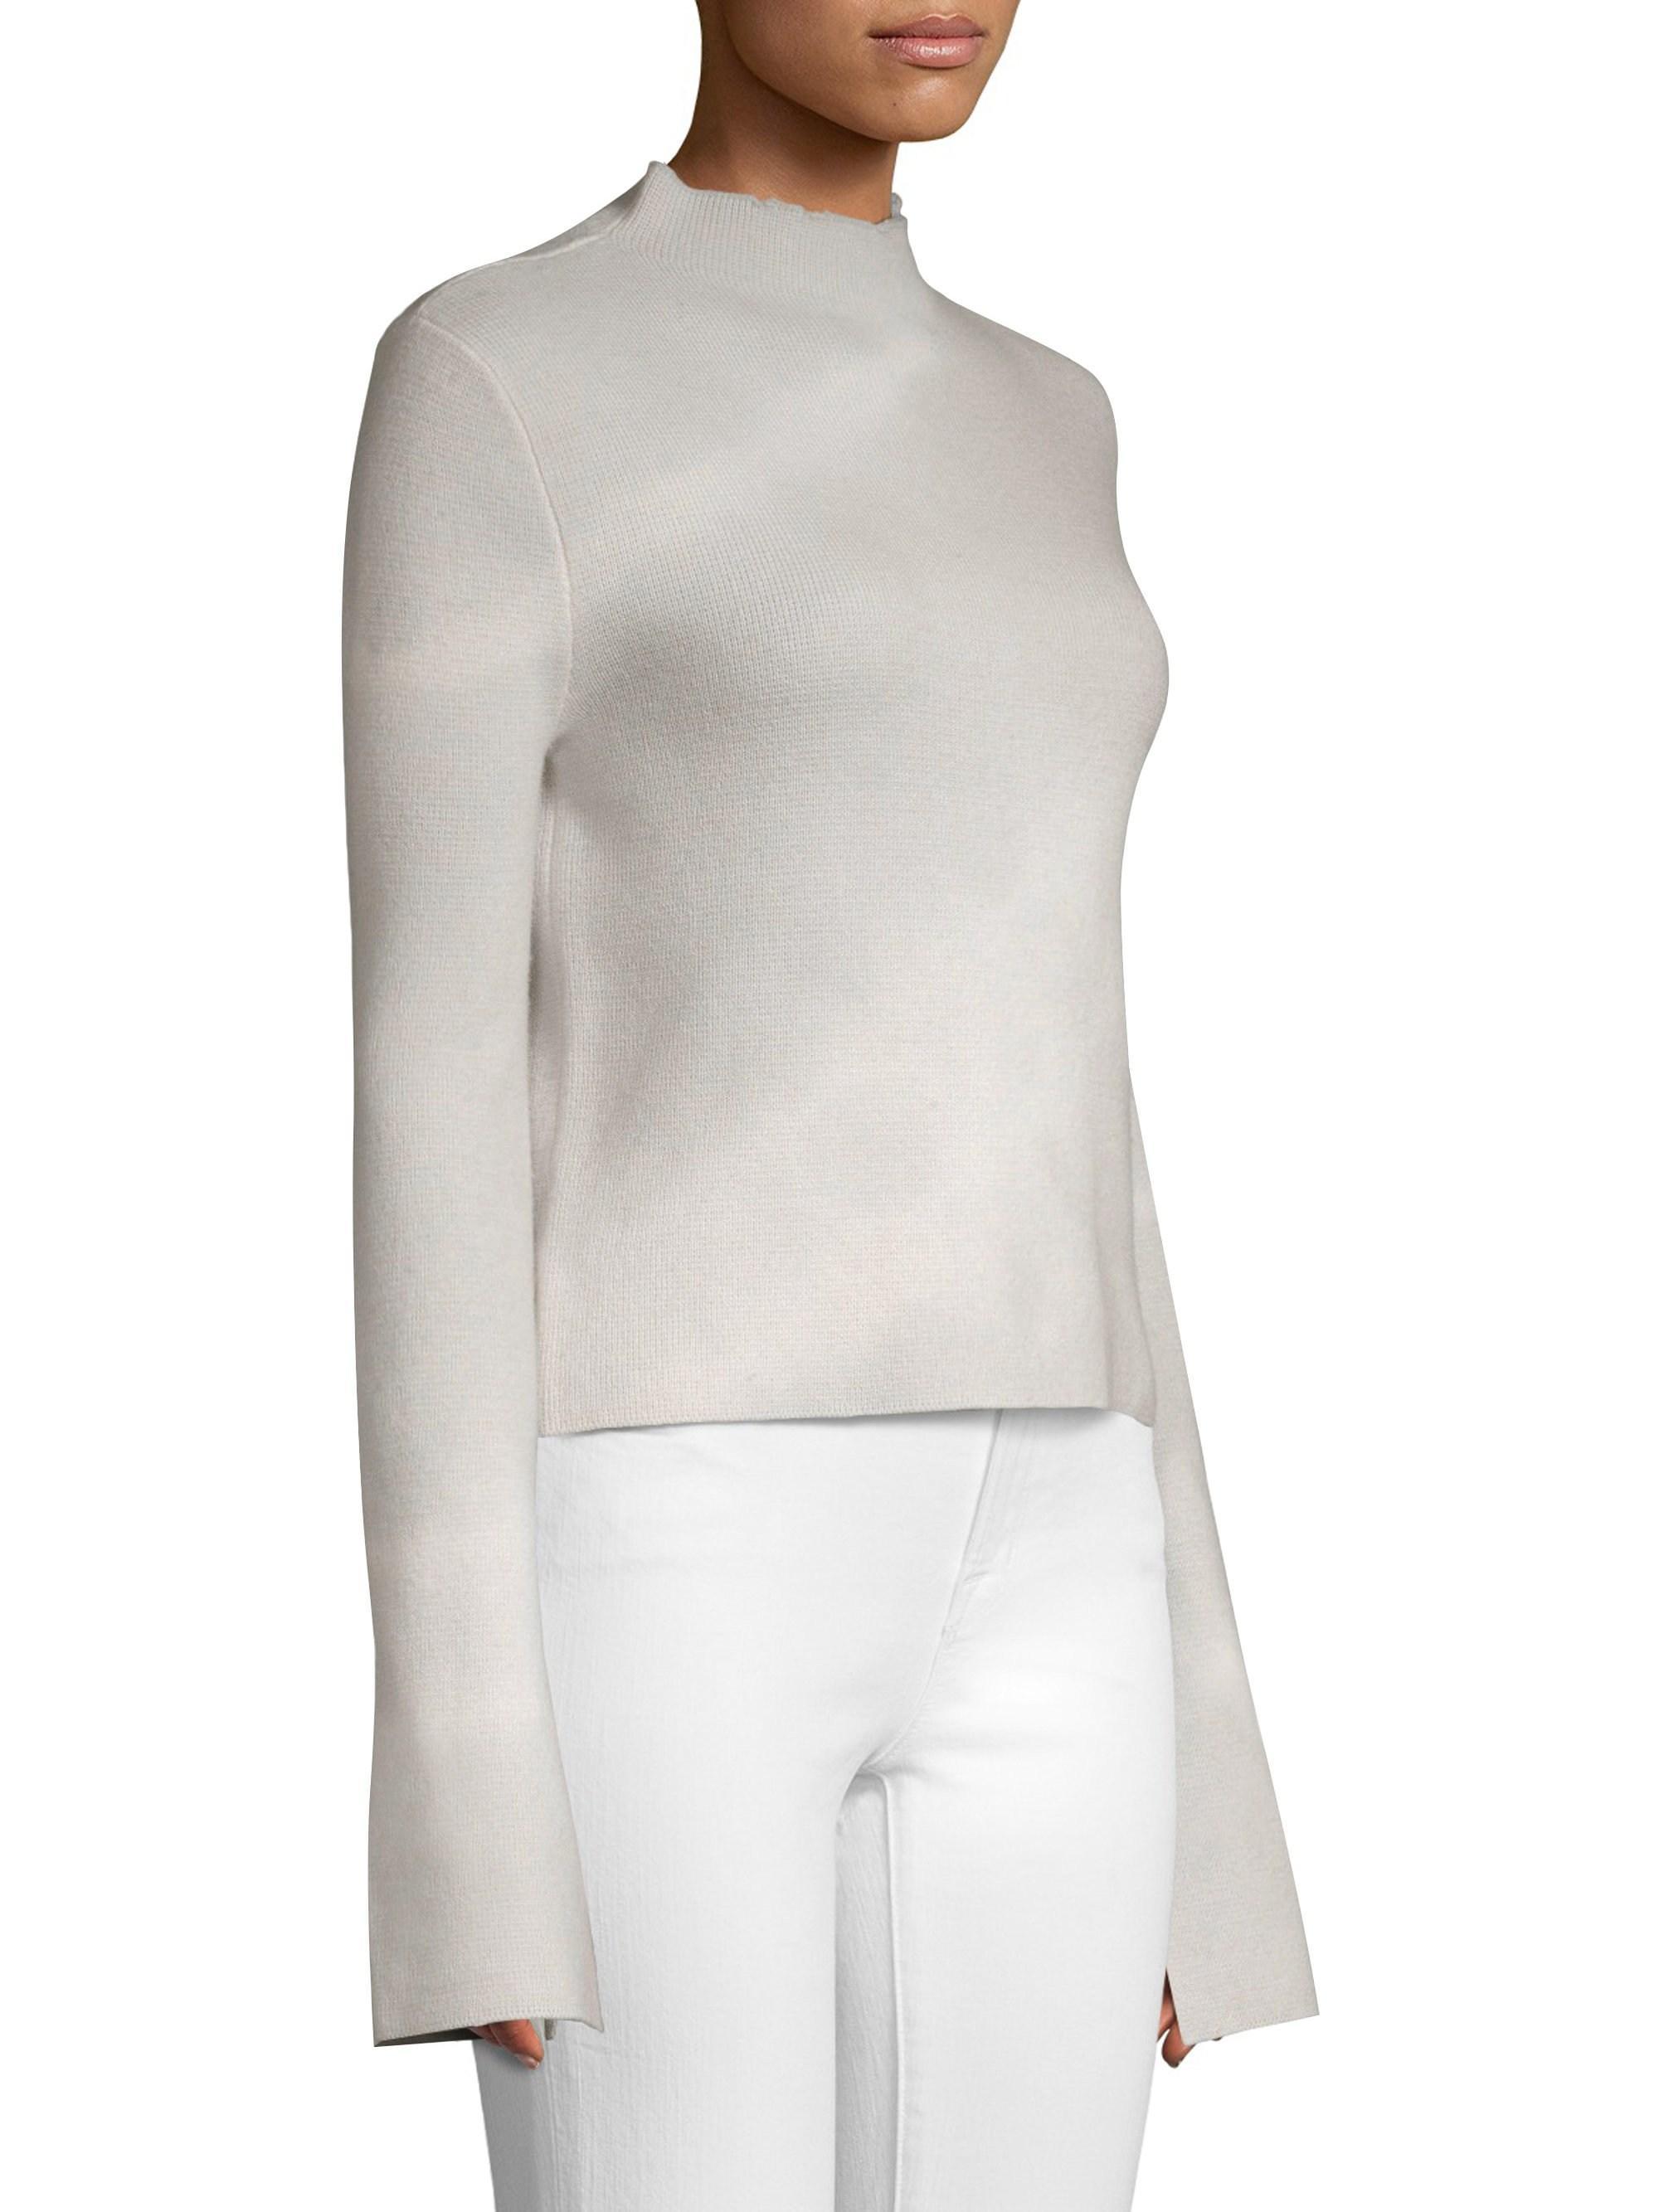 558f2e2a50b1ff Zoe Jordan Women s Munday Cashmere   Wool Funnelneck Sweater - Ash White in  White - Lyst